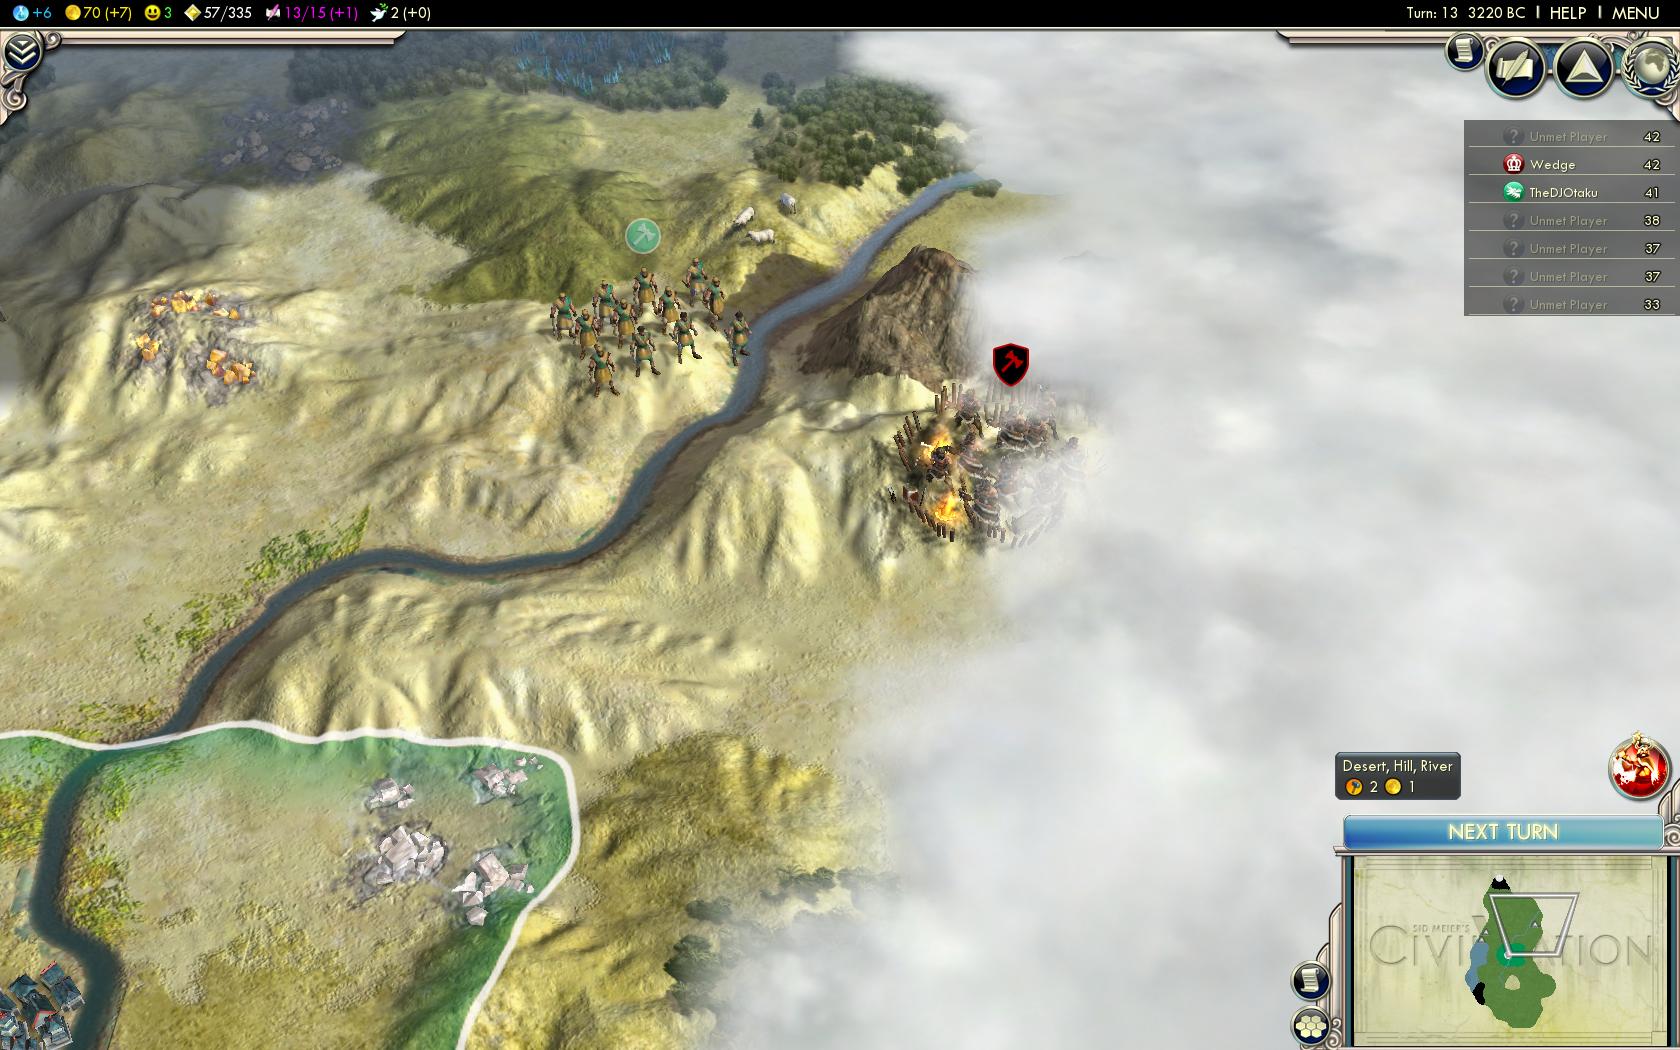 Civilization 5 - against Dave - Warriors locate barbarian camp - 3220 BC